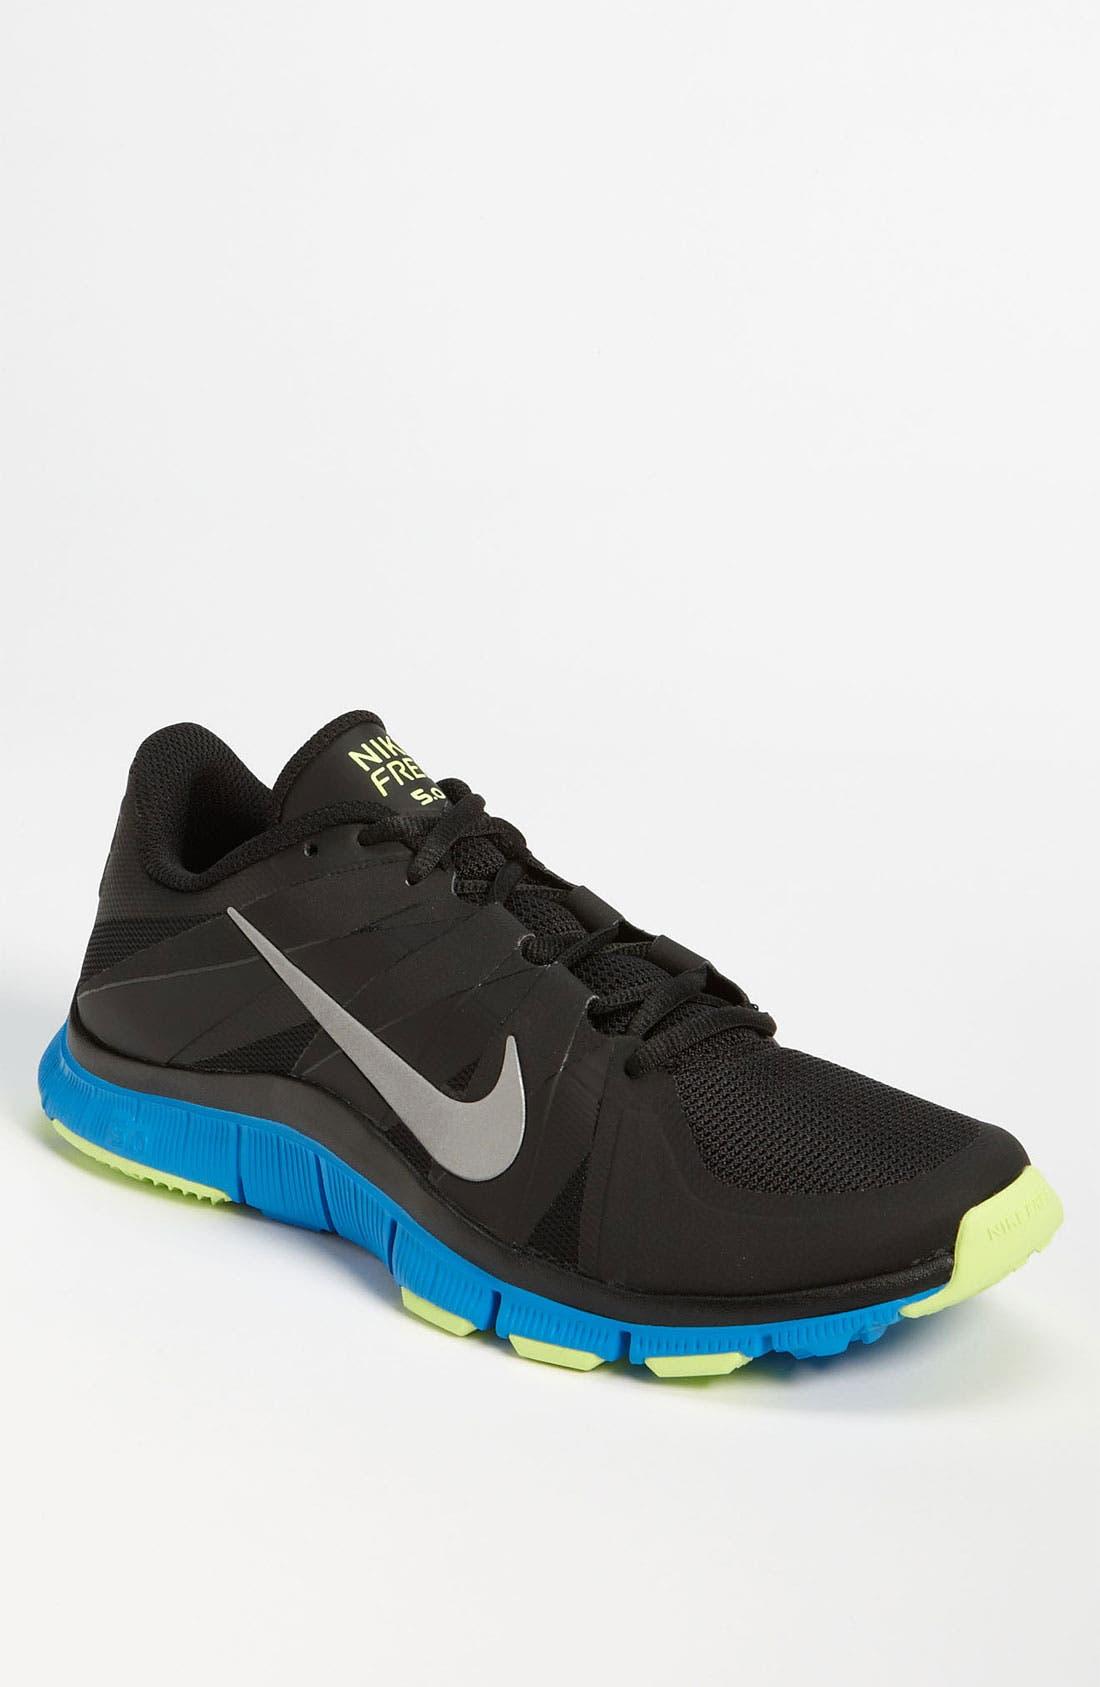 Main Image - Nike 'Free Trainer' Training Shoe (Men)